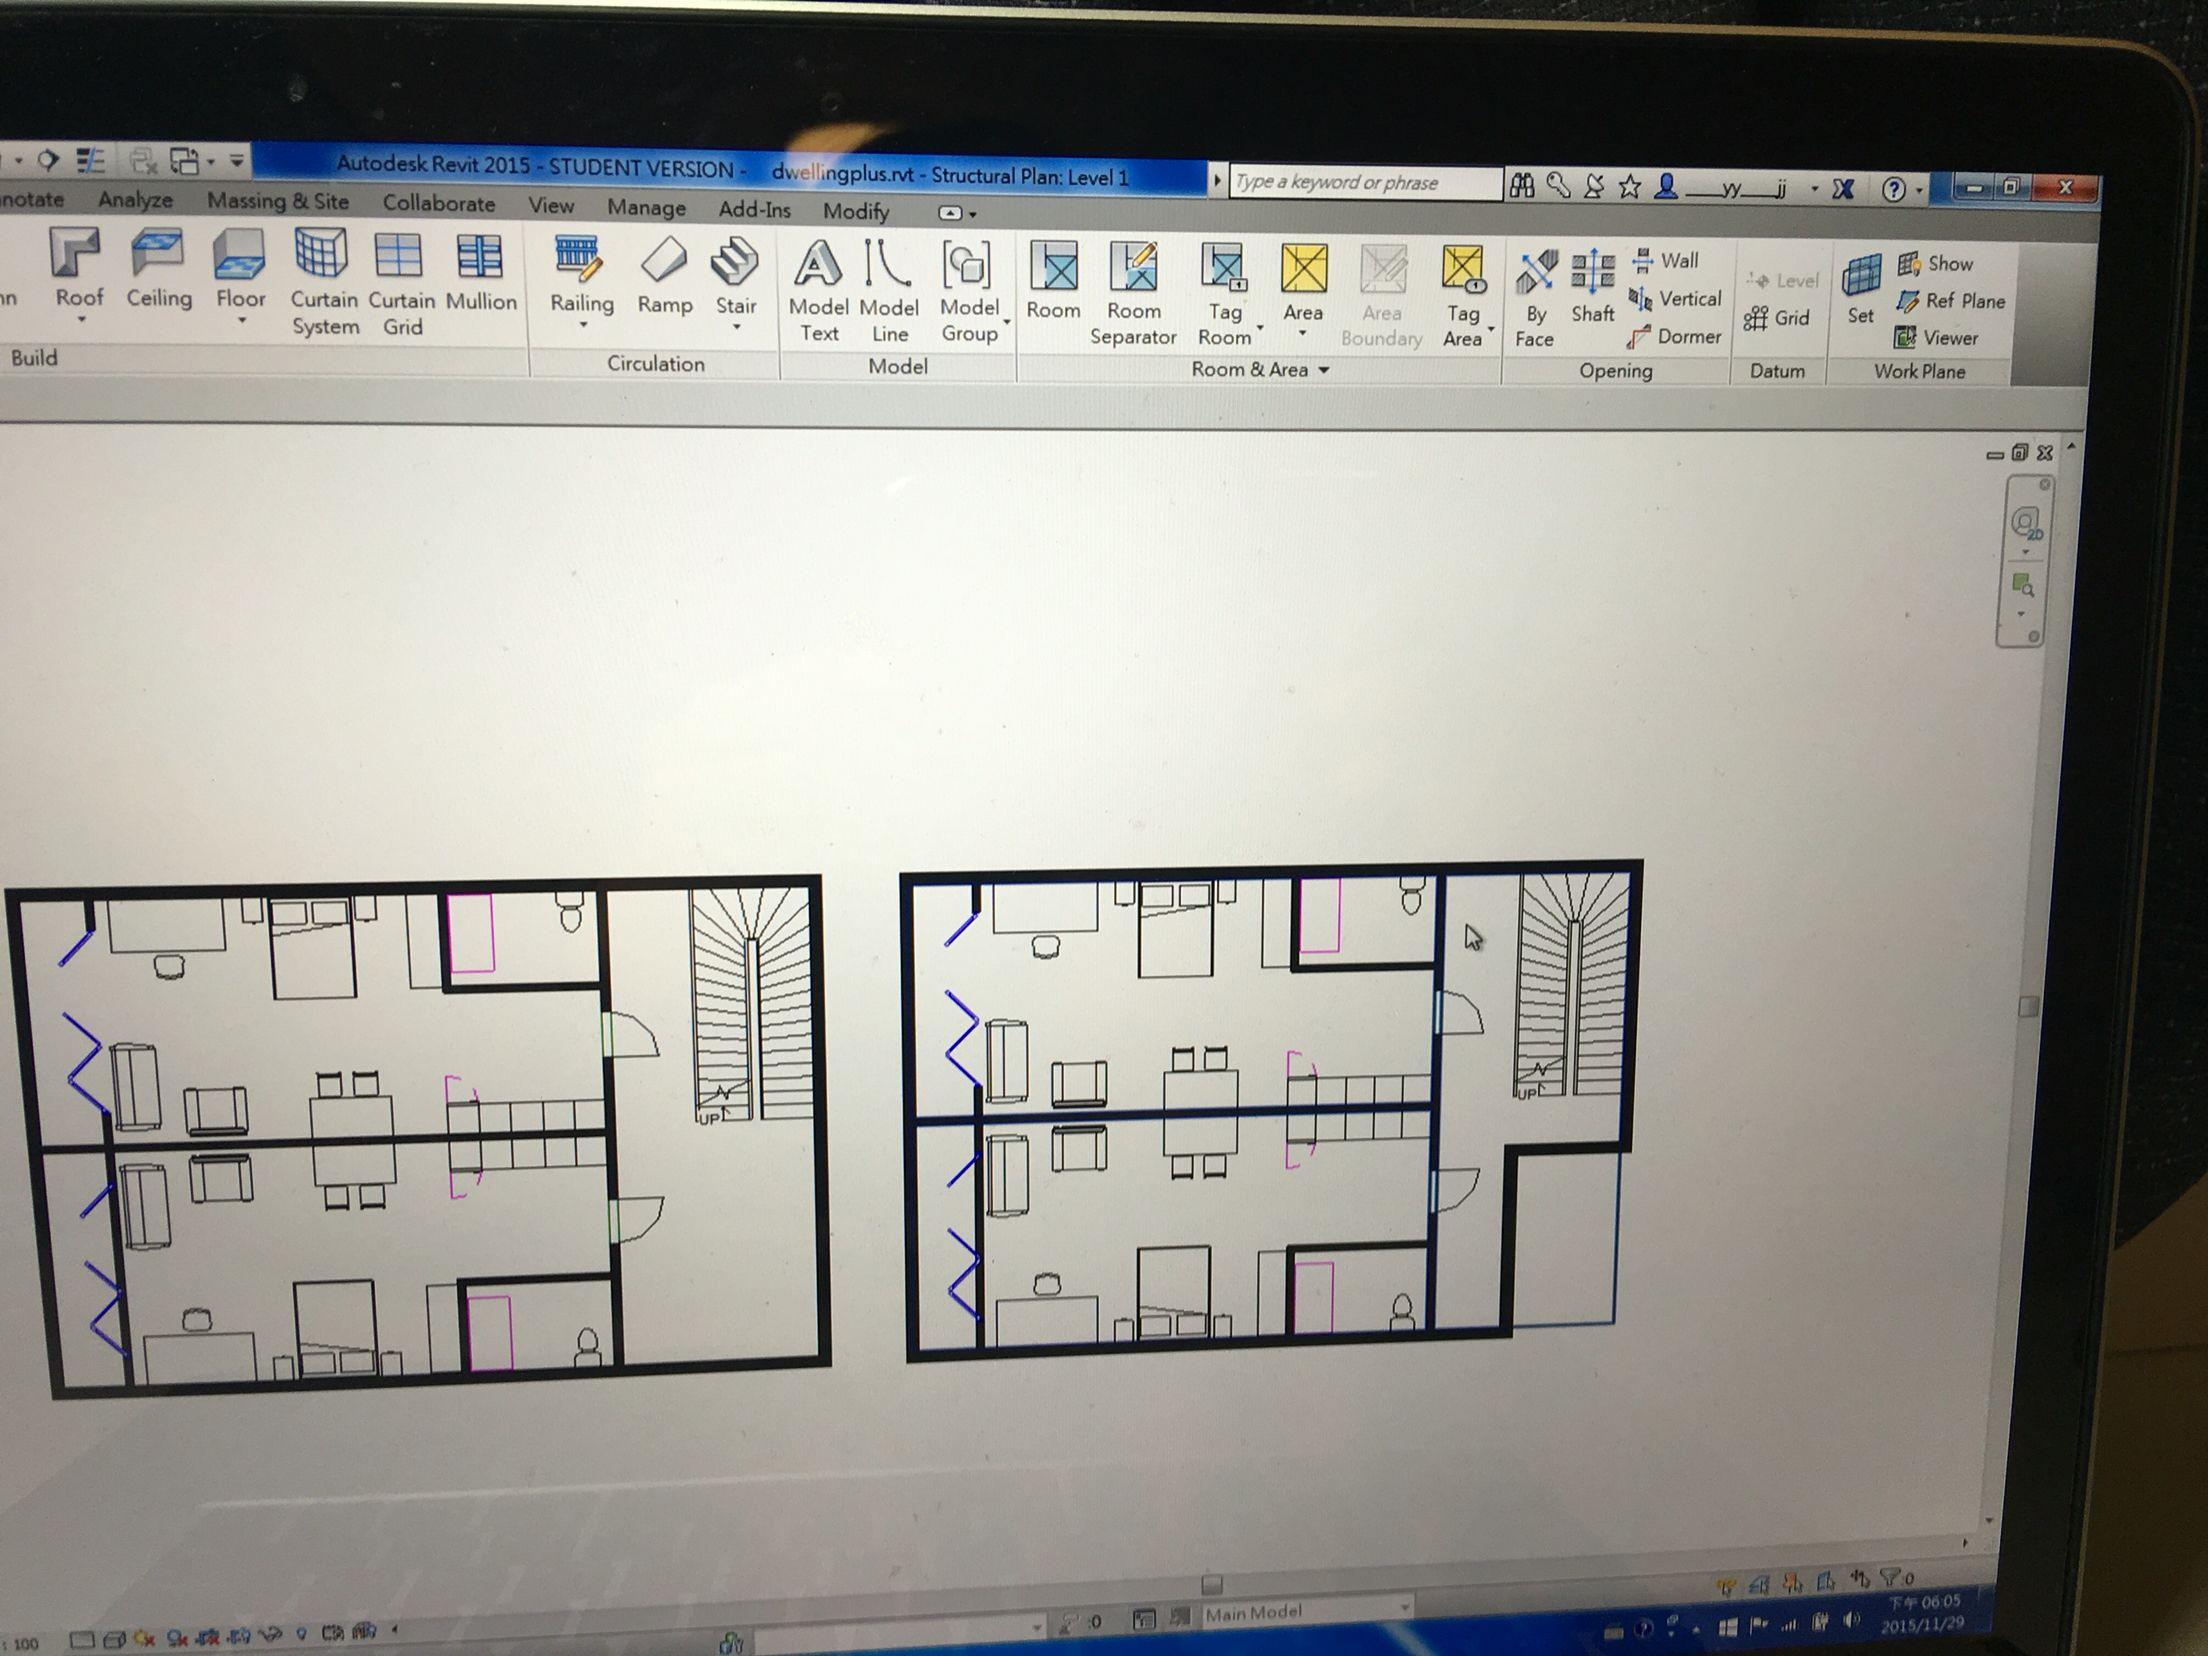 Week One Development Plan Roof Ceiling Ceiling Curtains Dormers